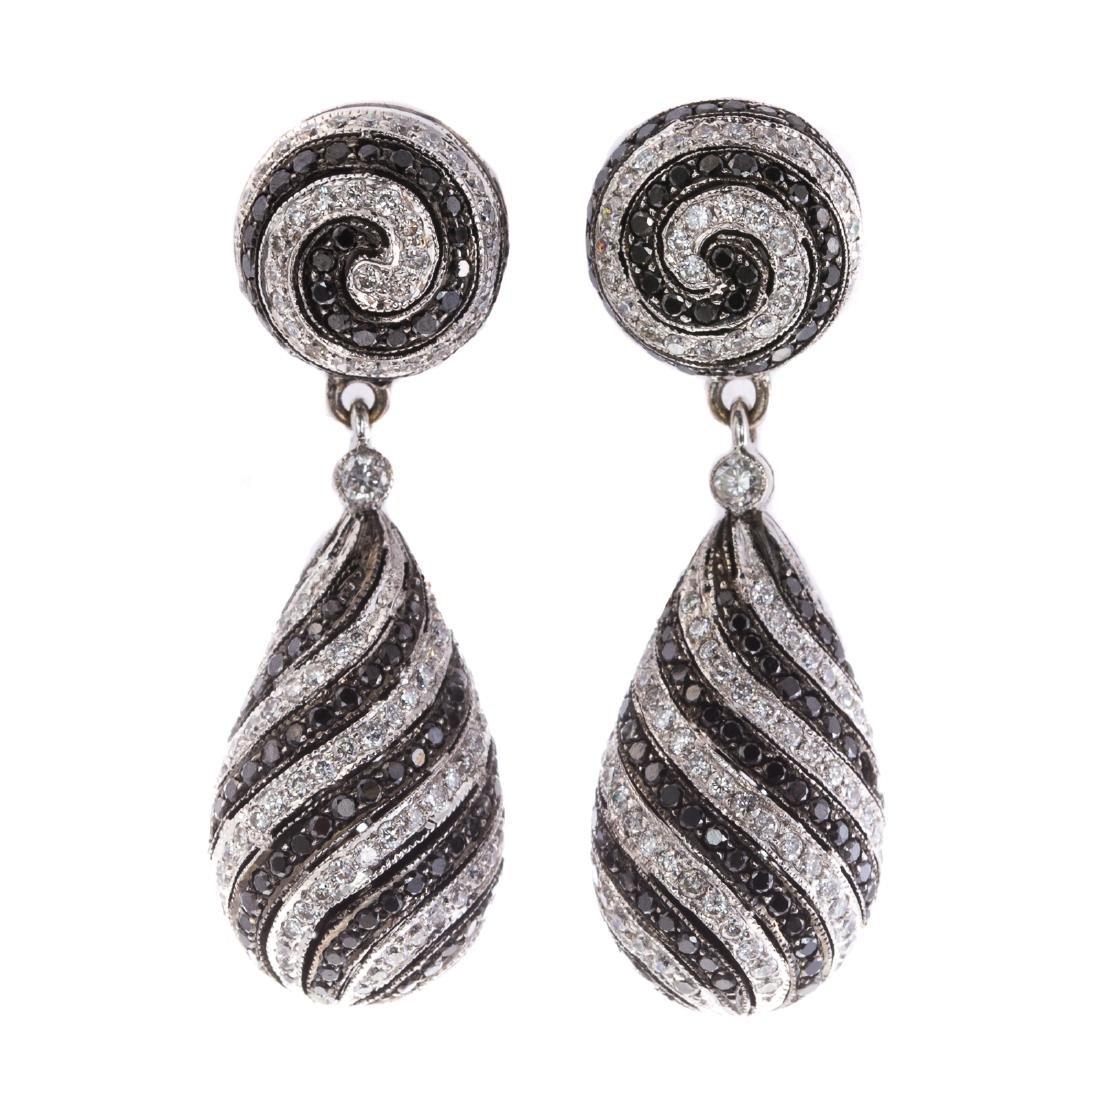 A Pair of Spiral Black & White Diamond Earrings